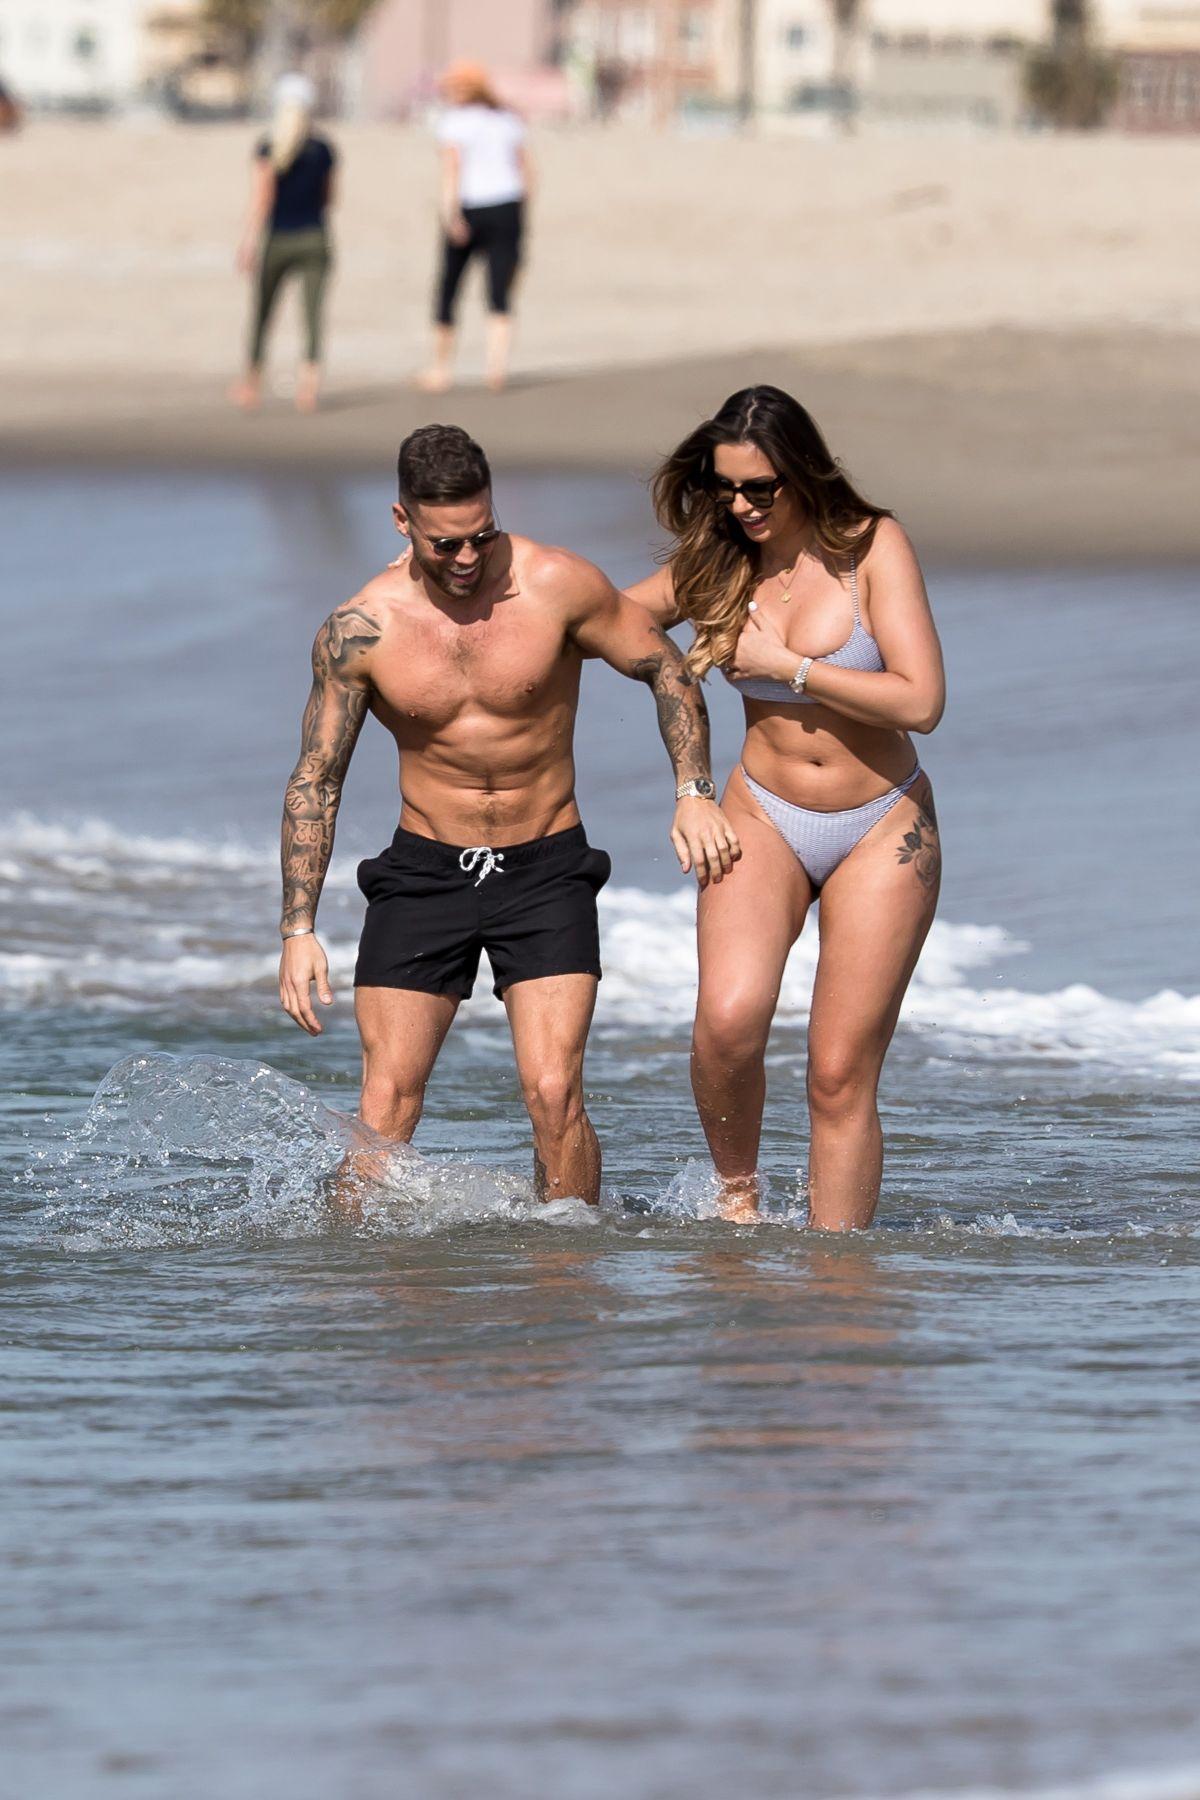 Jessica Shears in Bikini at the beach in Santa Monica Pic 10 of 35